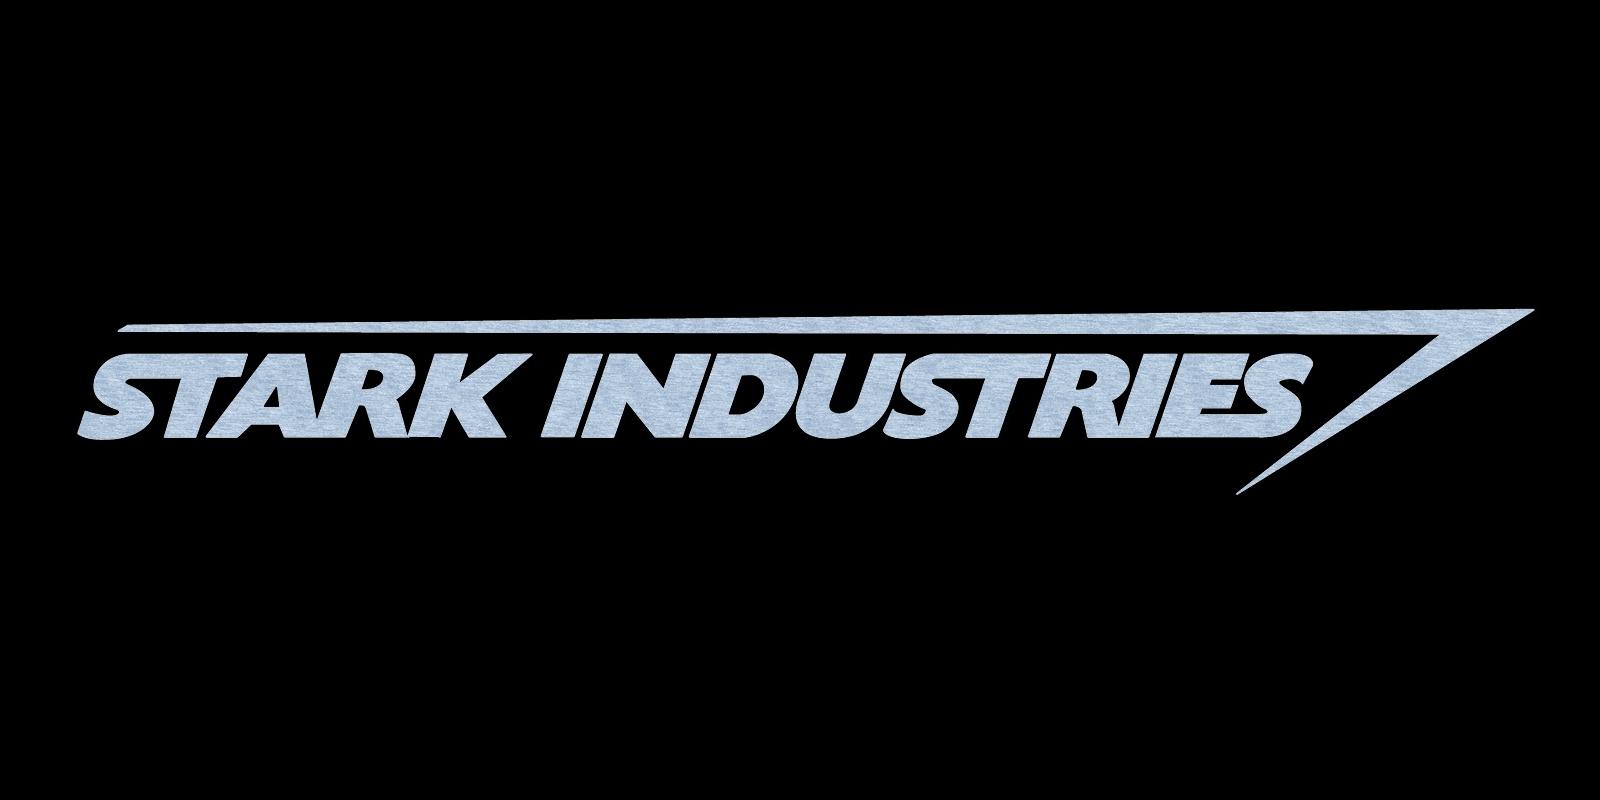 Stark Industries - Marvel Cinematic Universe Wiki